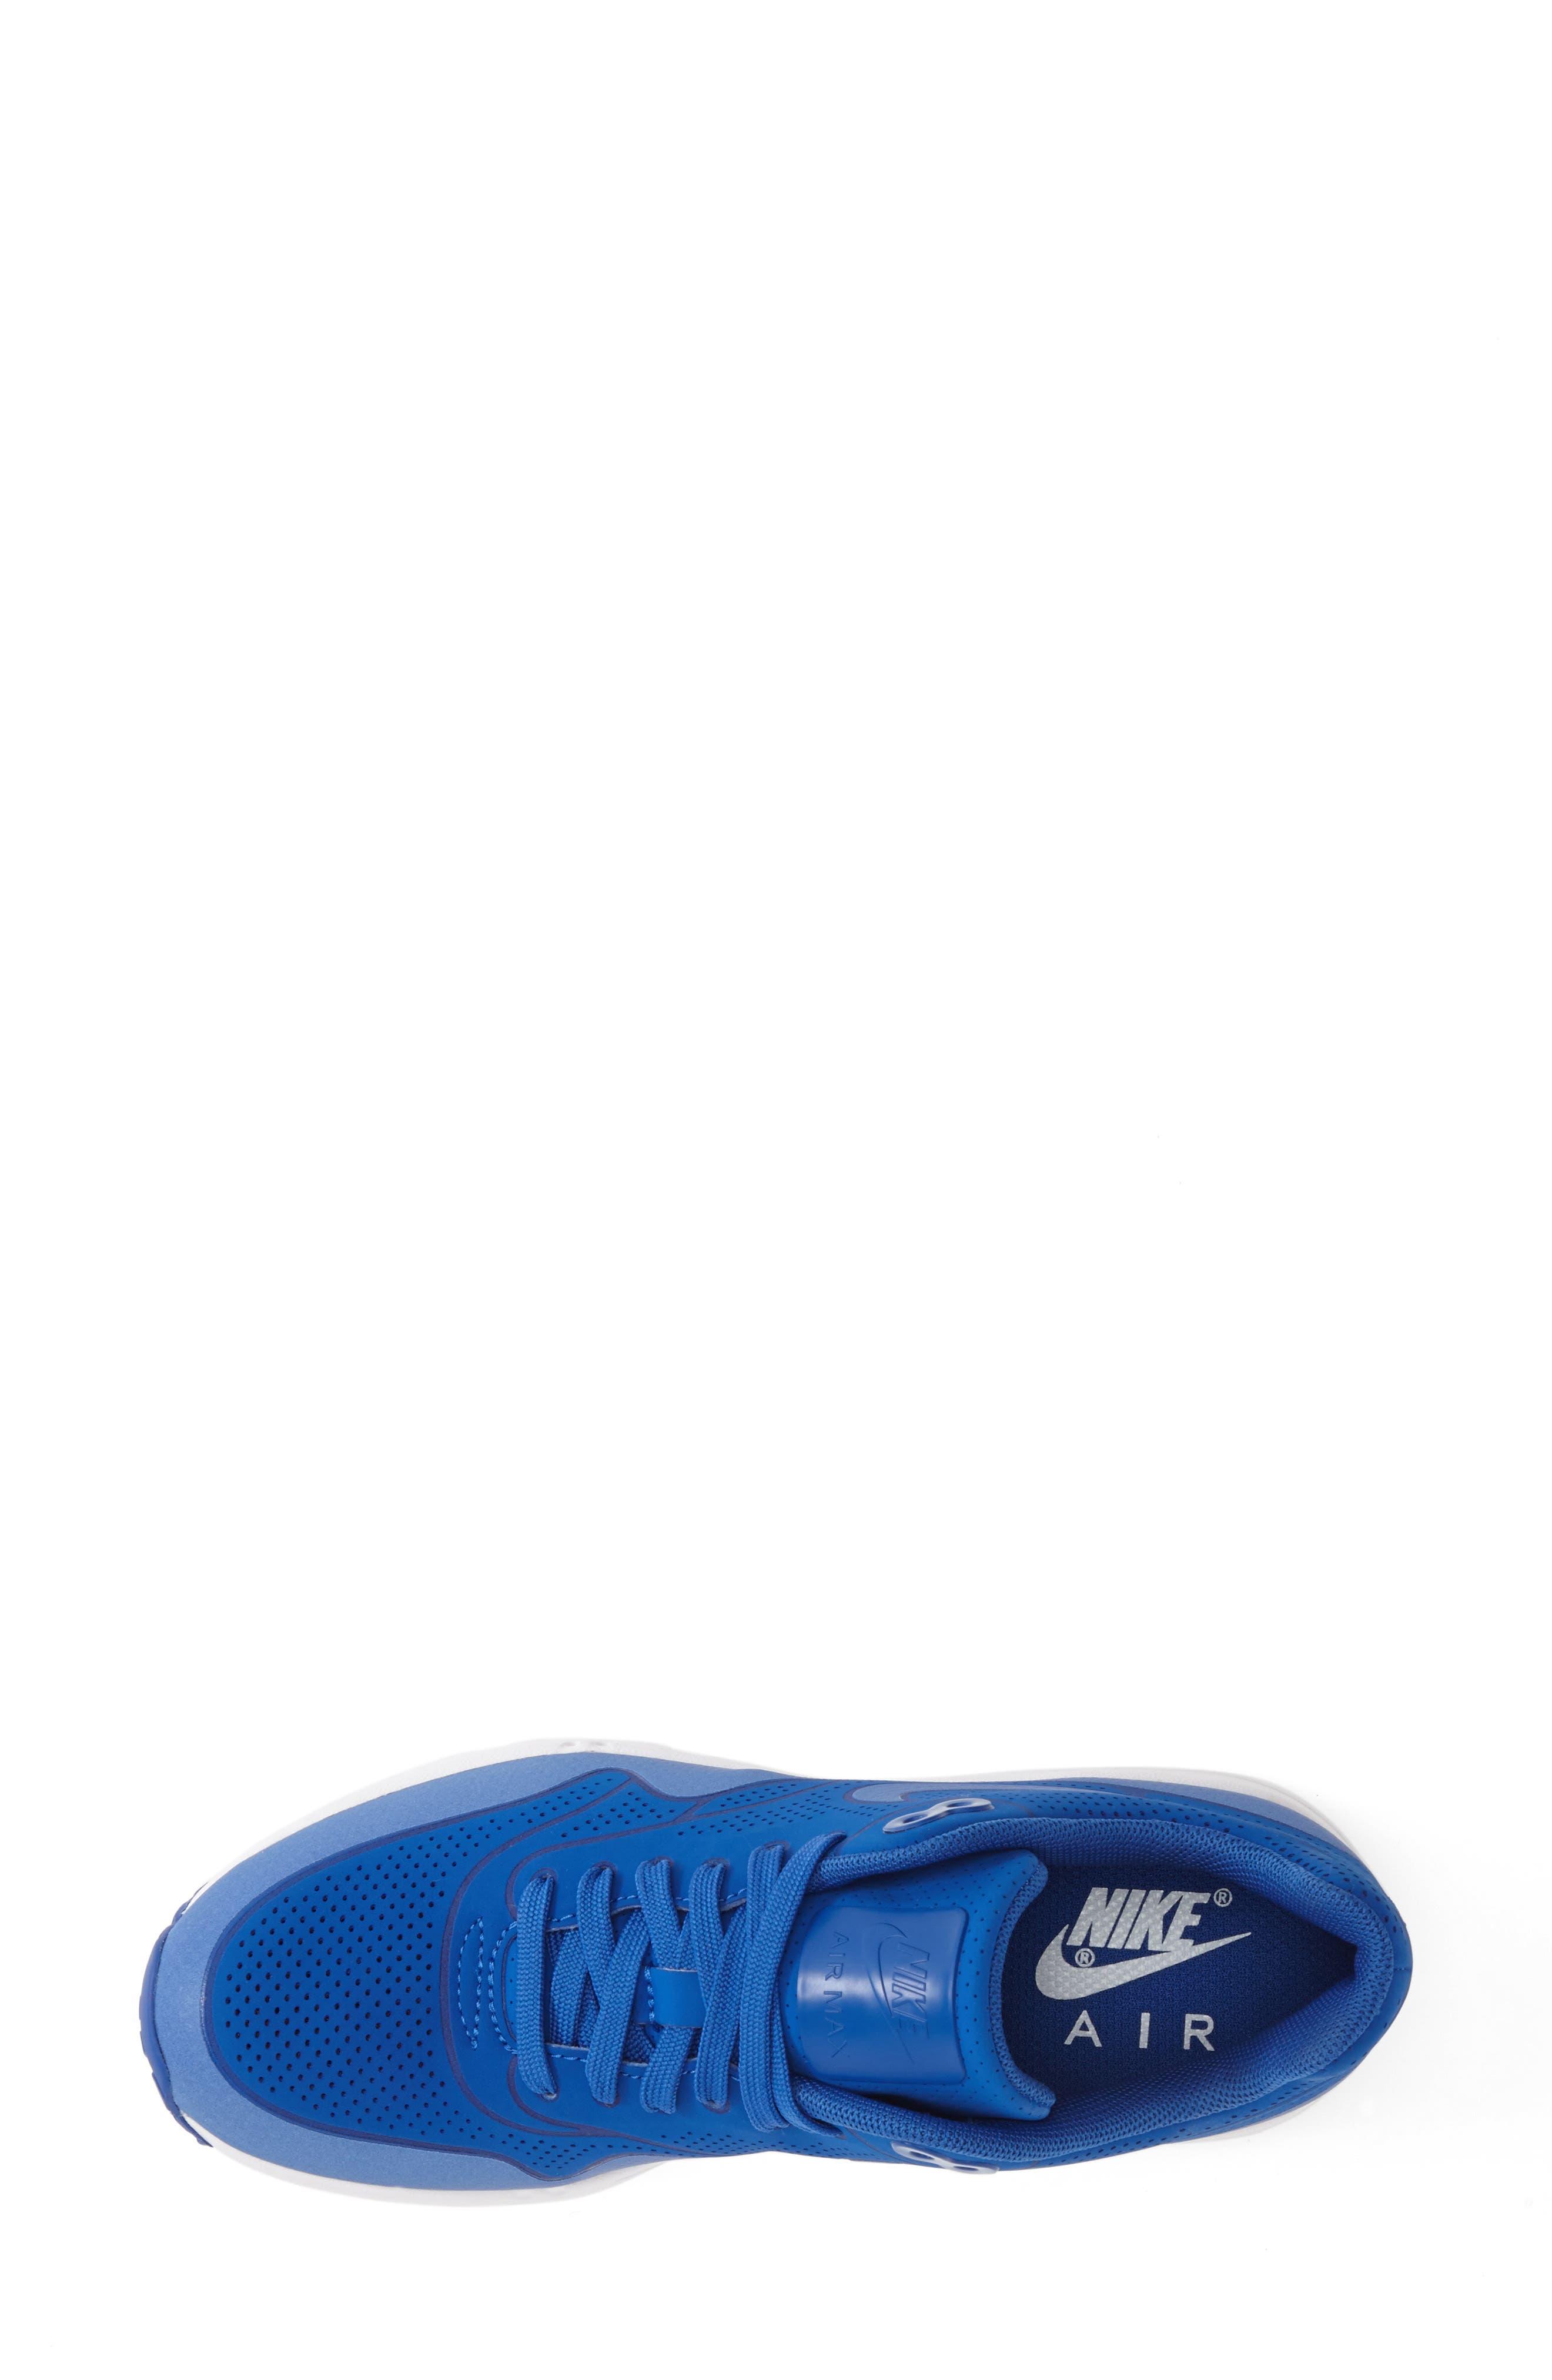 ,                             'Air Max 1 - Ultra Moire' Sneaker,                             Alternate thumbnail 66, color,                             400